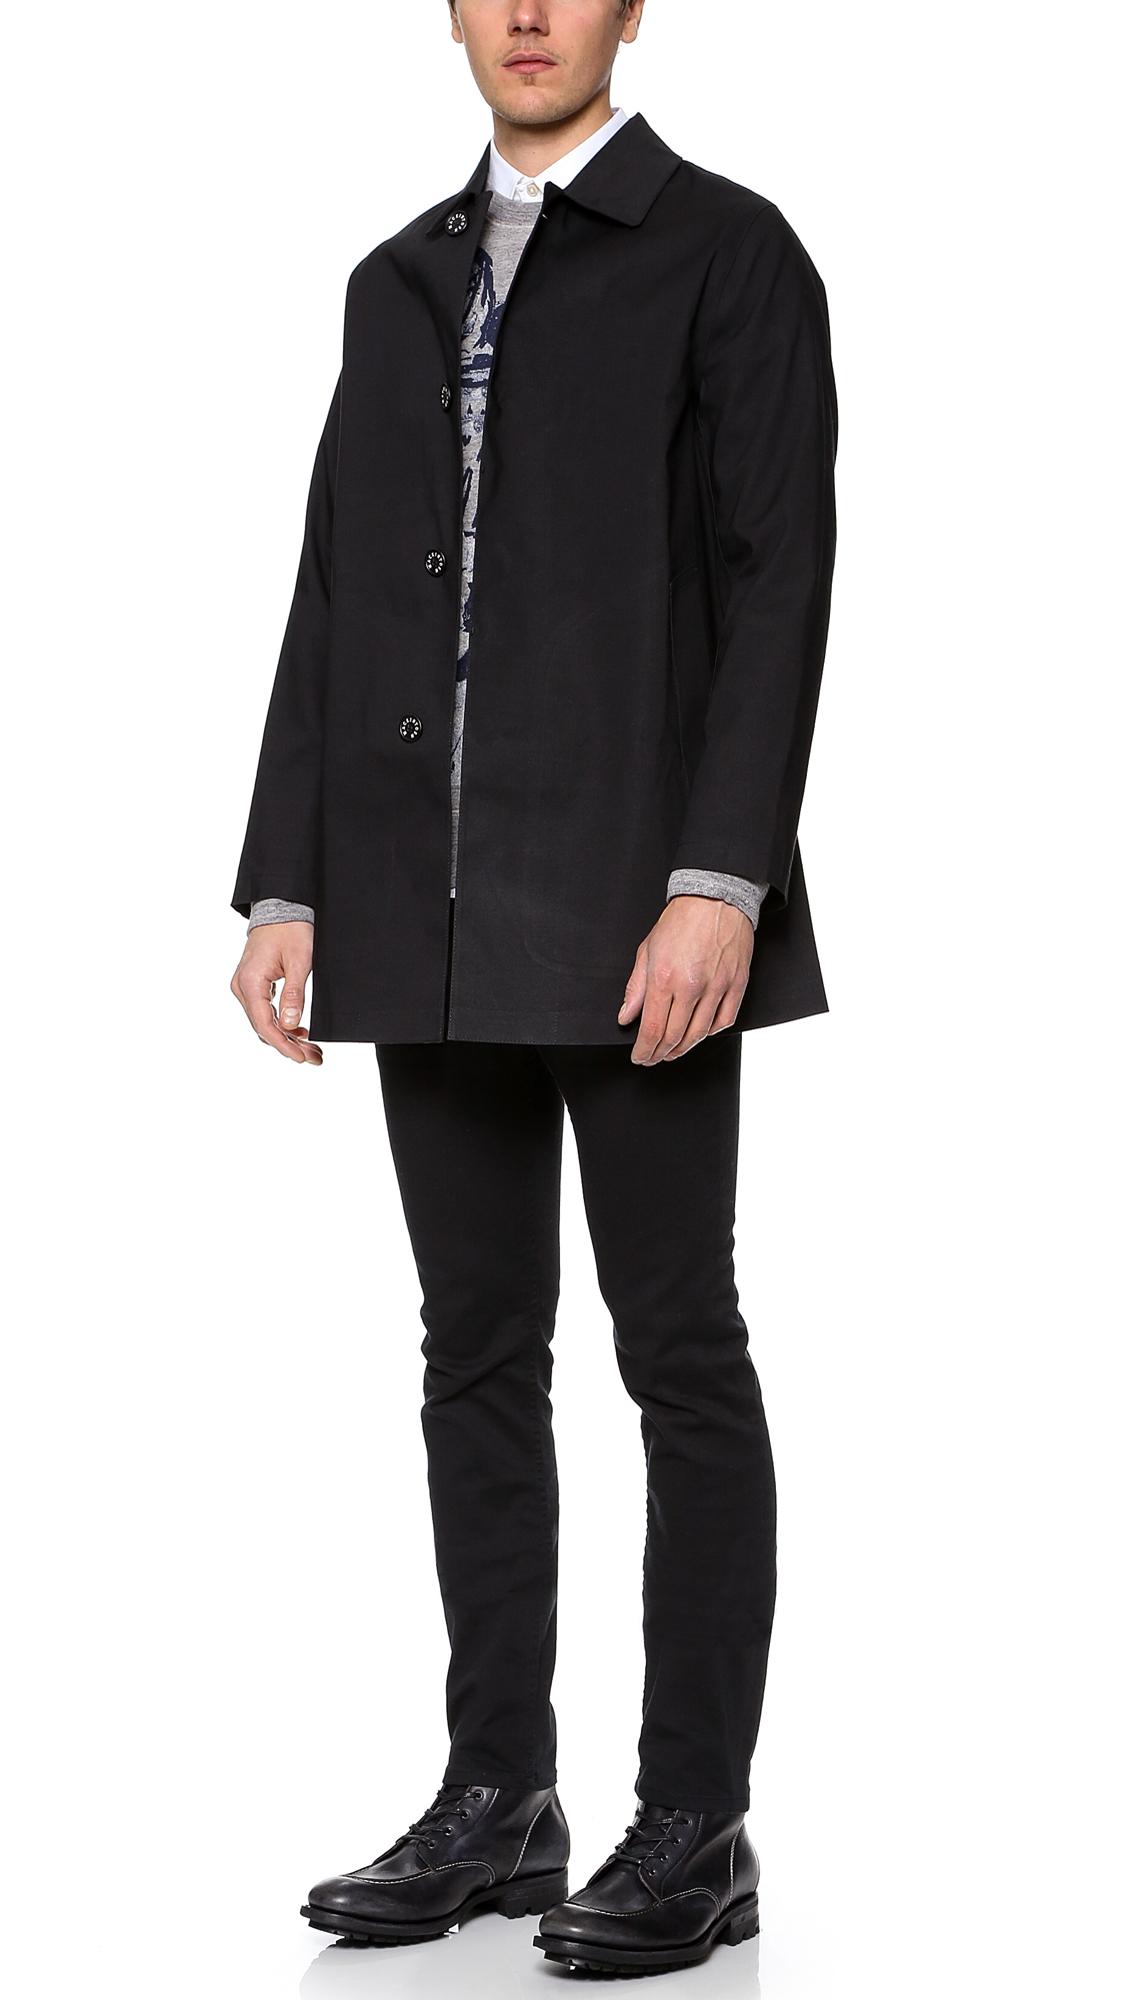 Mackintosh Dunoon Bonded Raincoat in Black for Men - Lyst